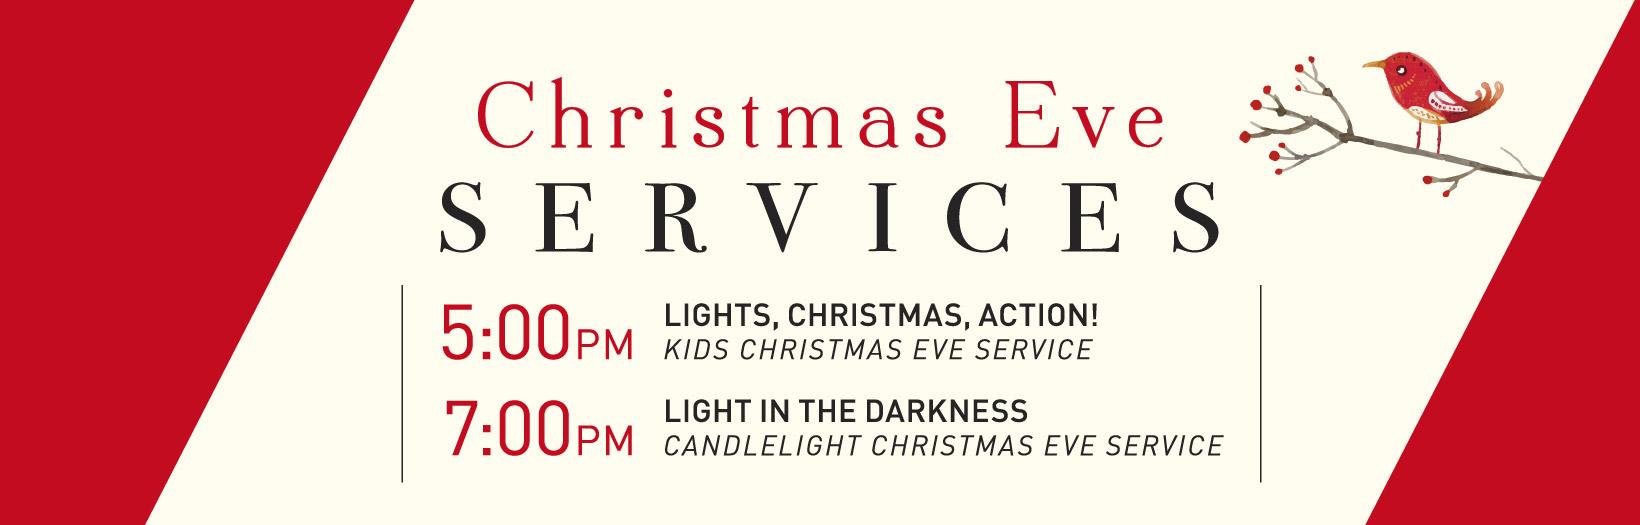 Christmas Eve Services | NHUnited.org